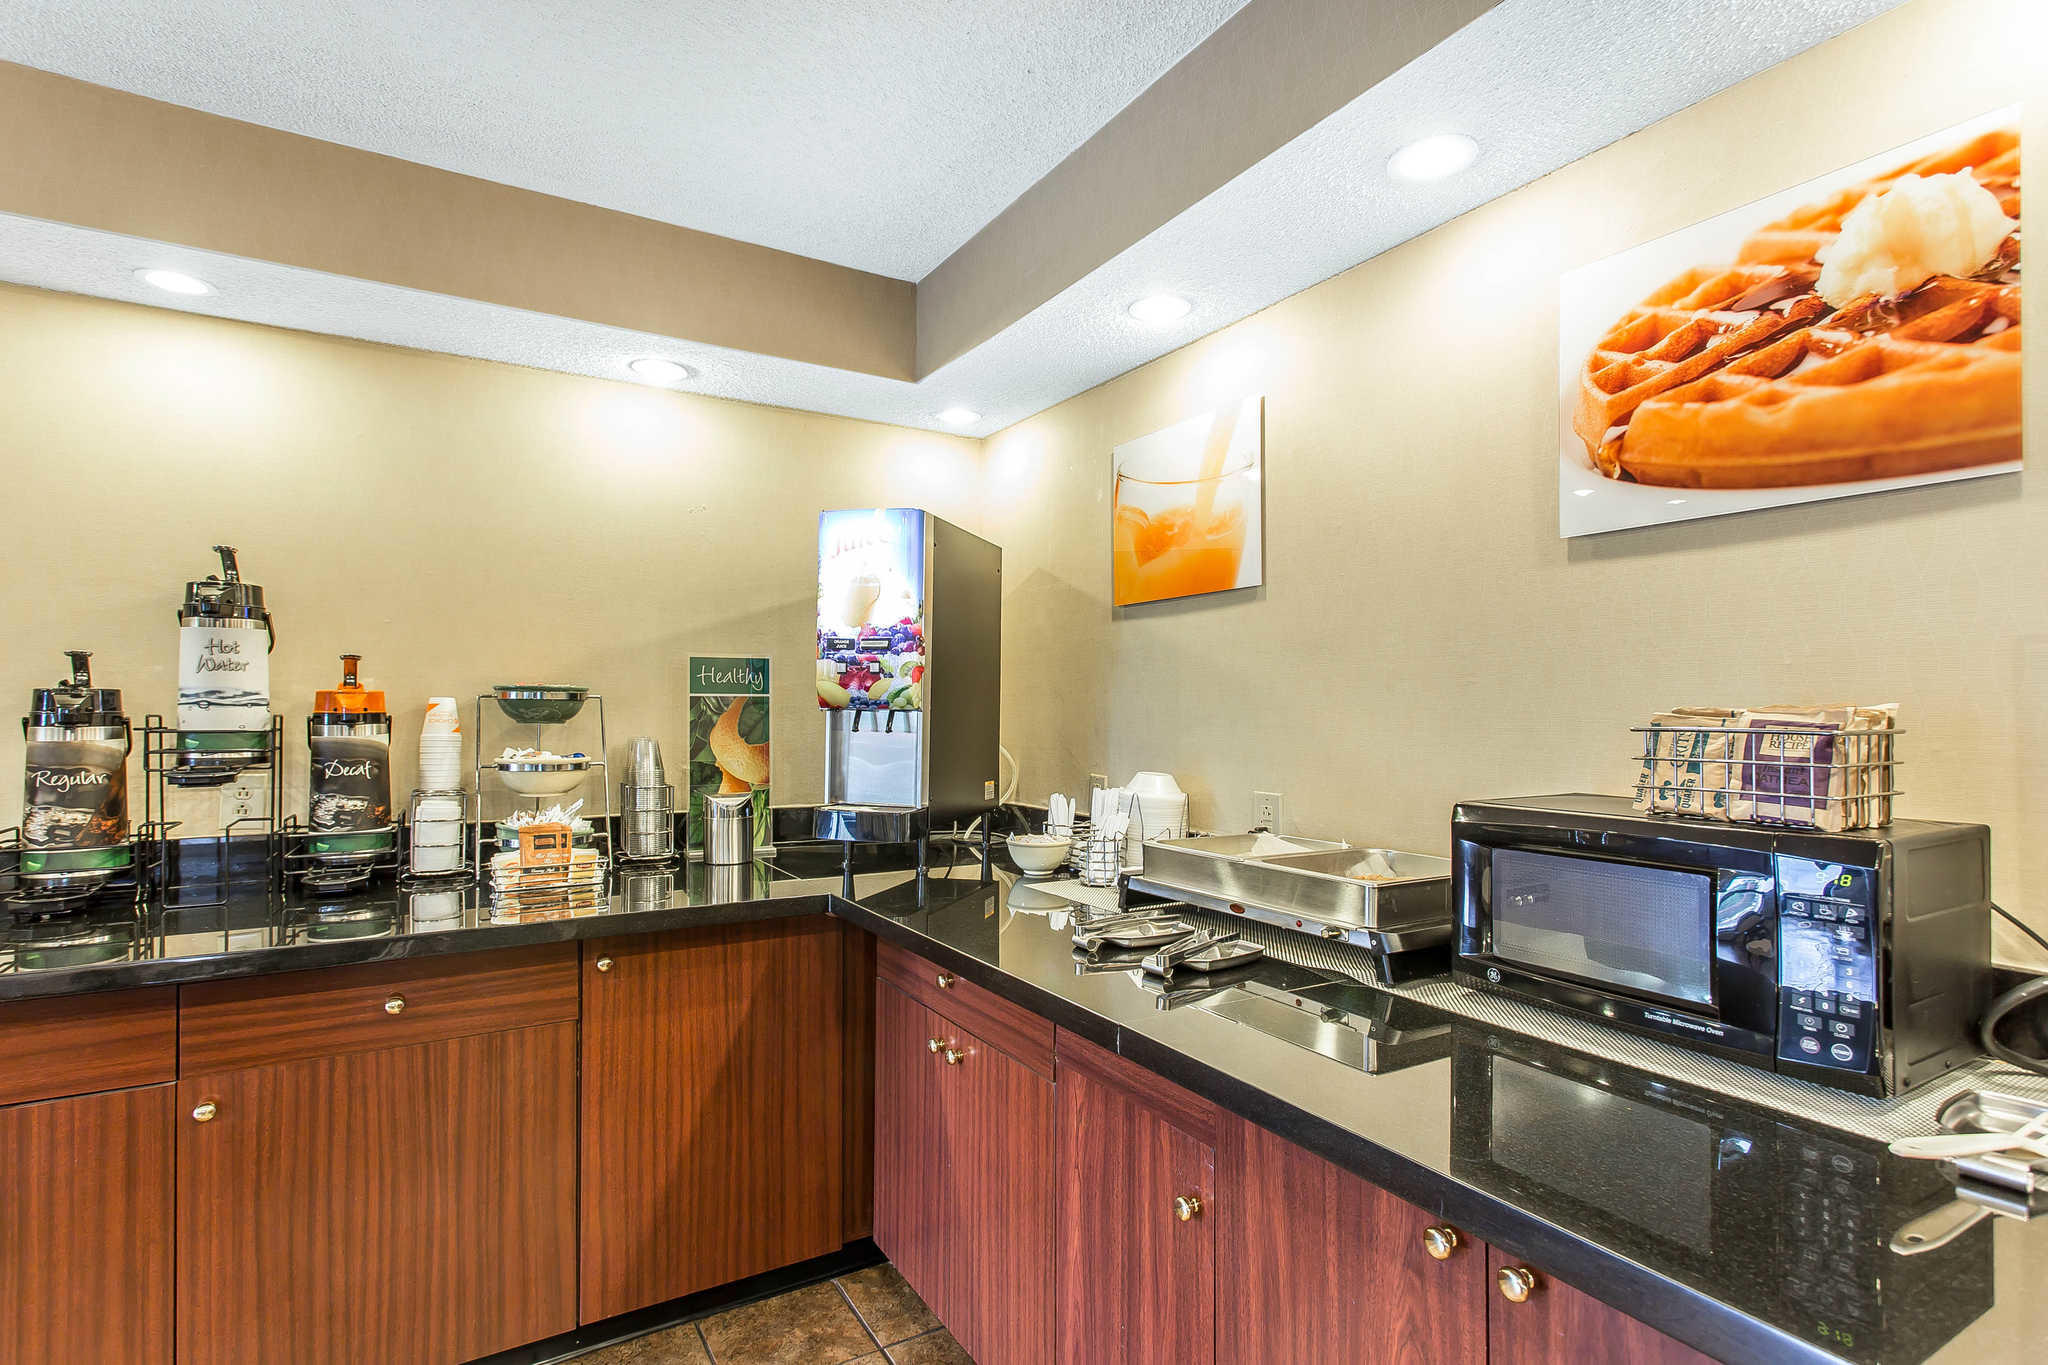 Quality Inn image 18